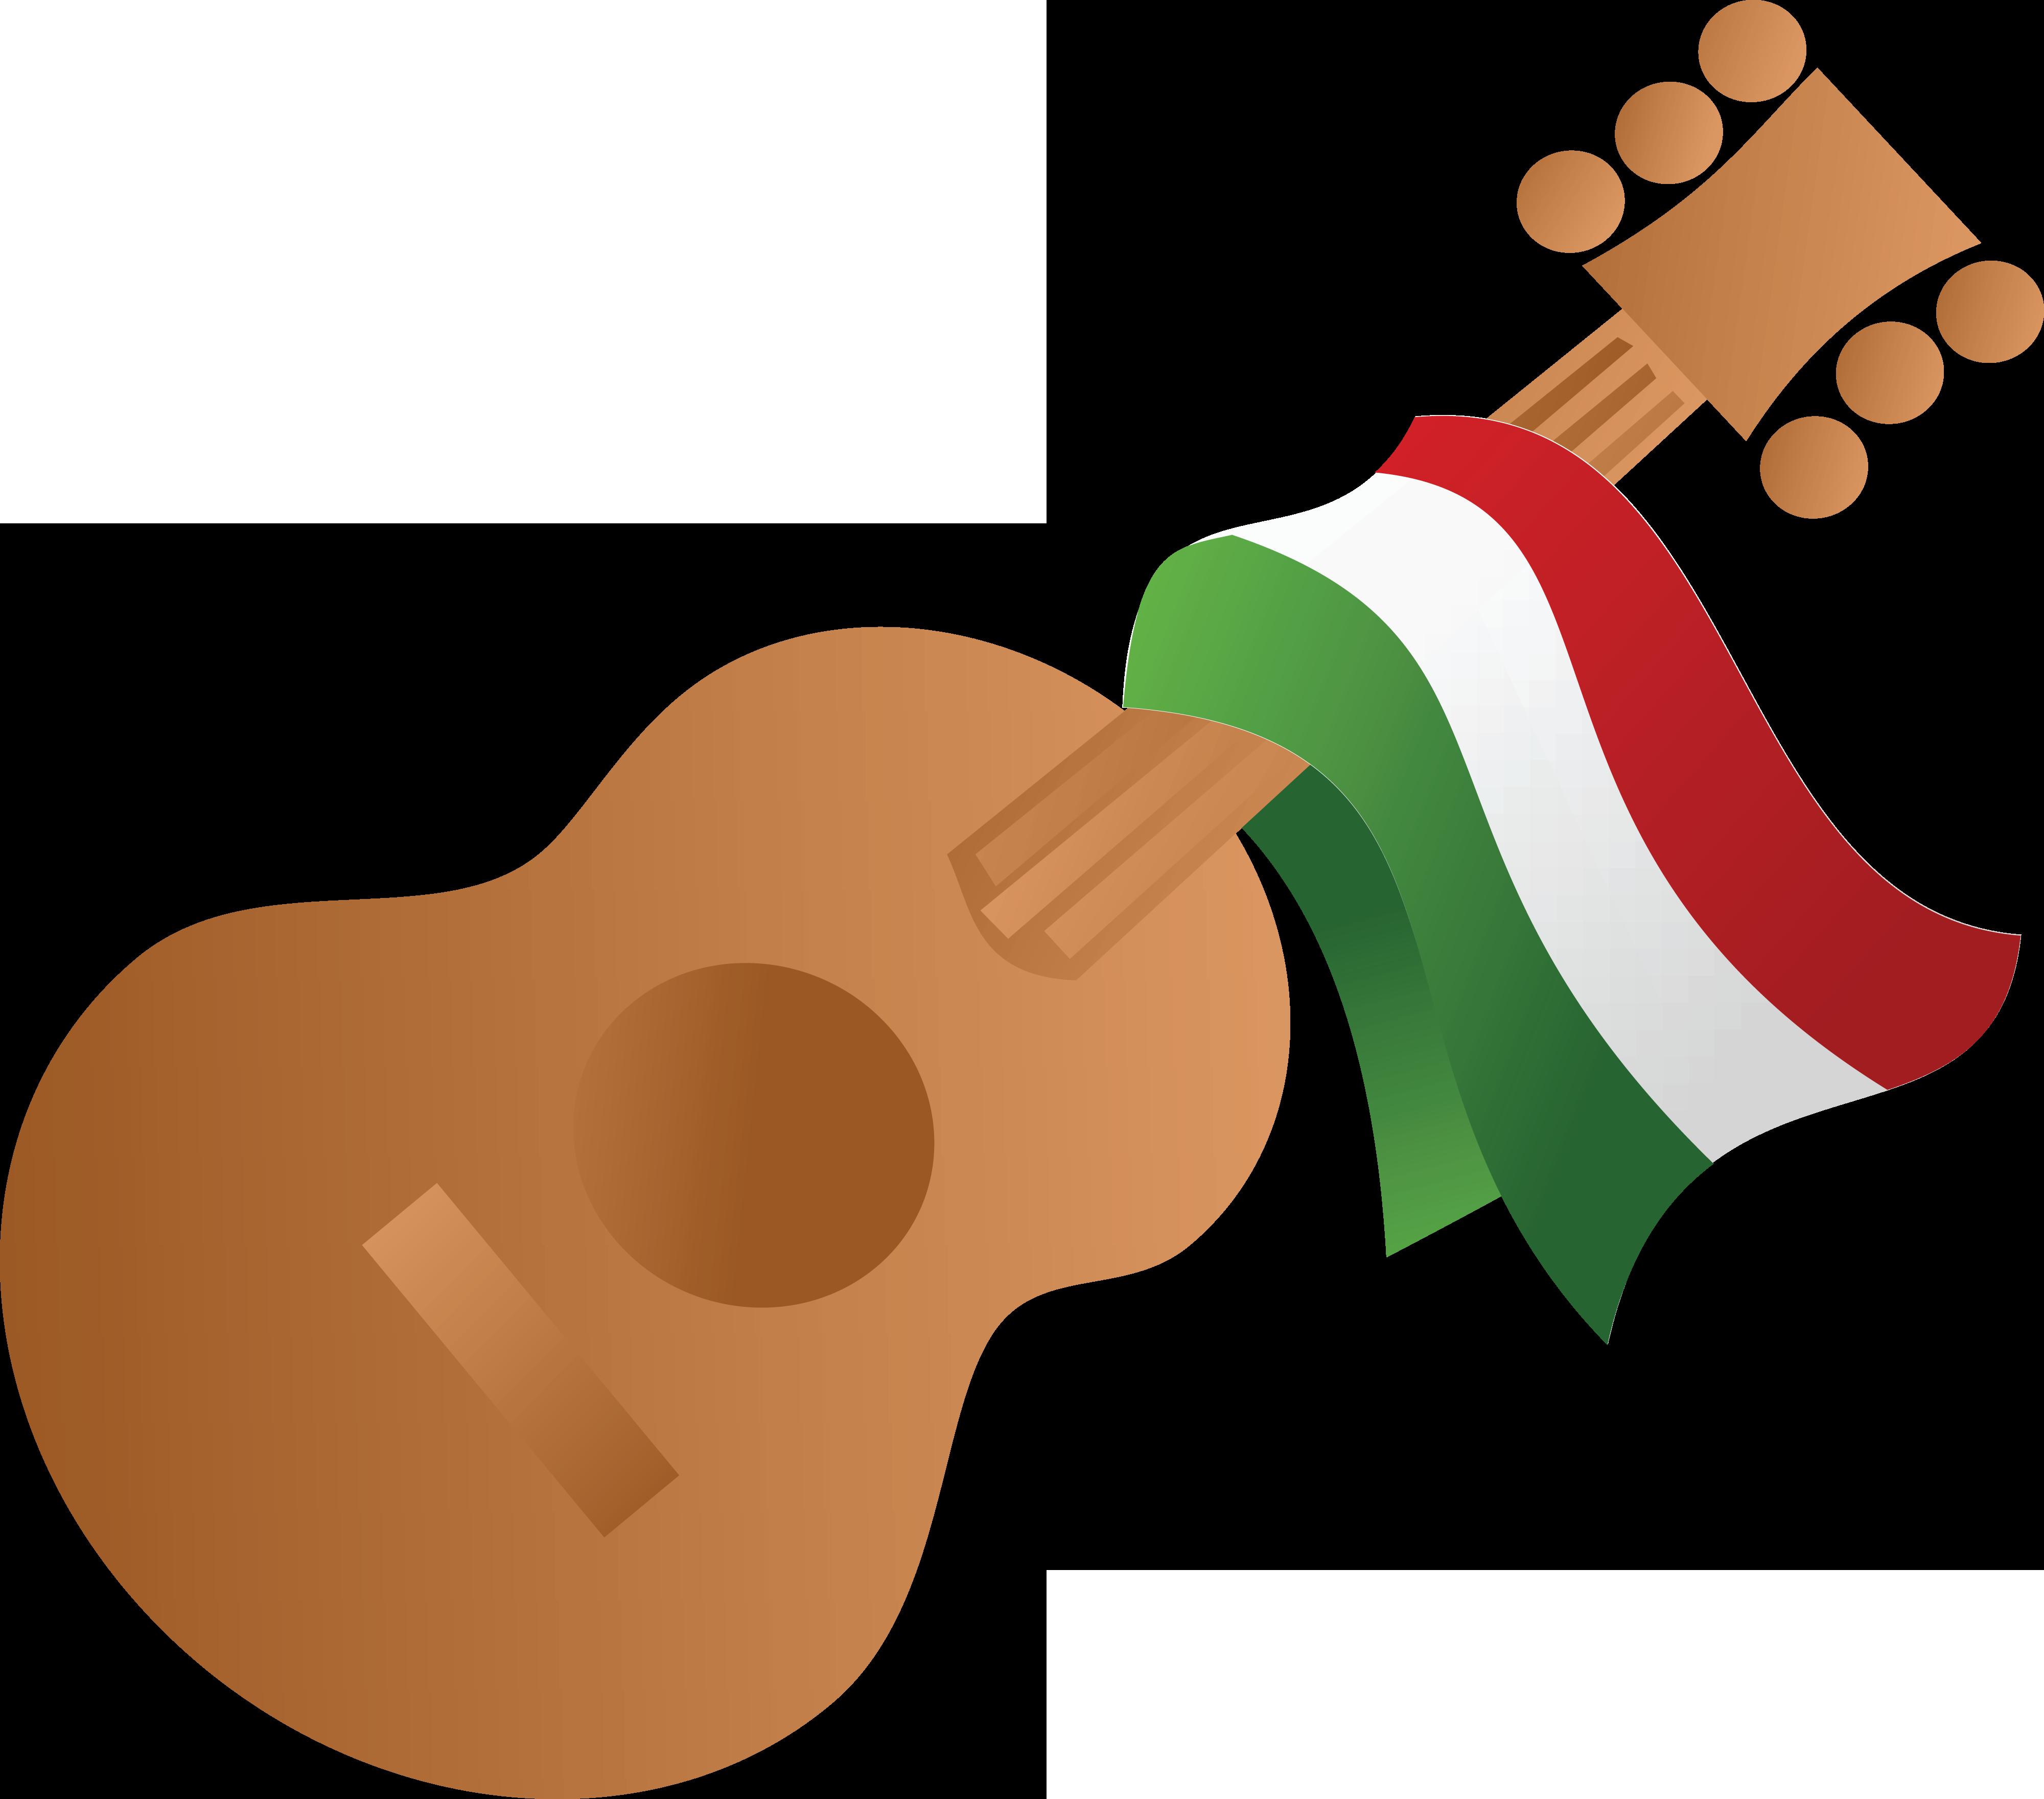 Free guitar clip art. Vegetables clipart mexican